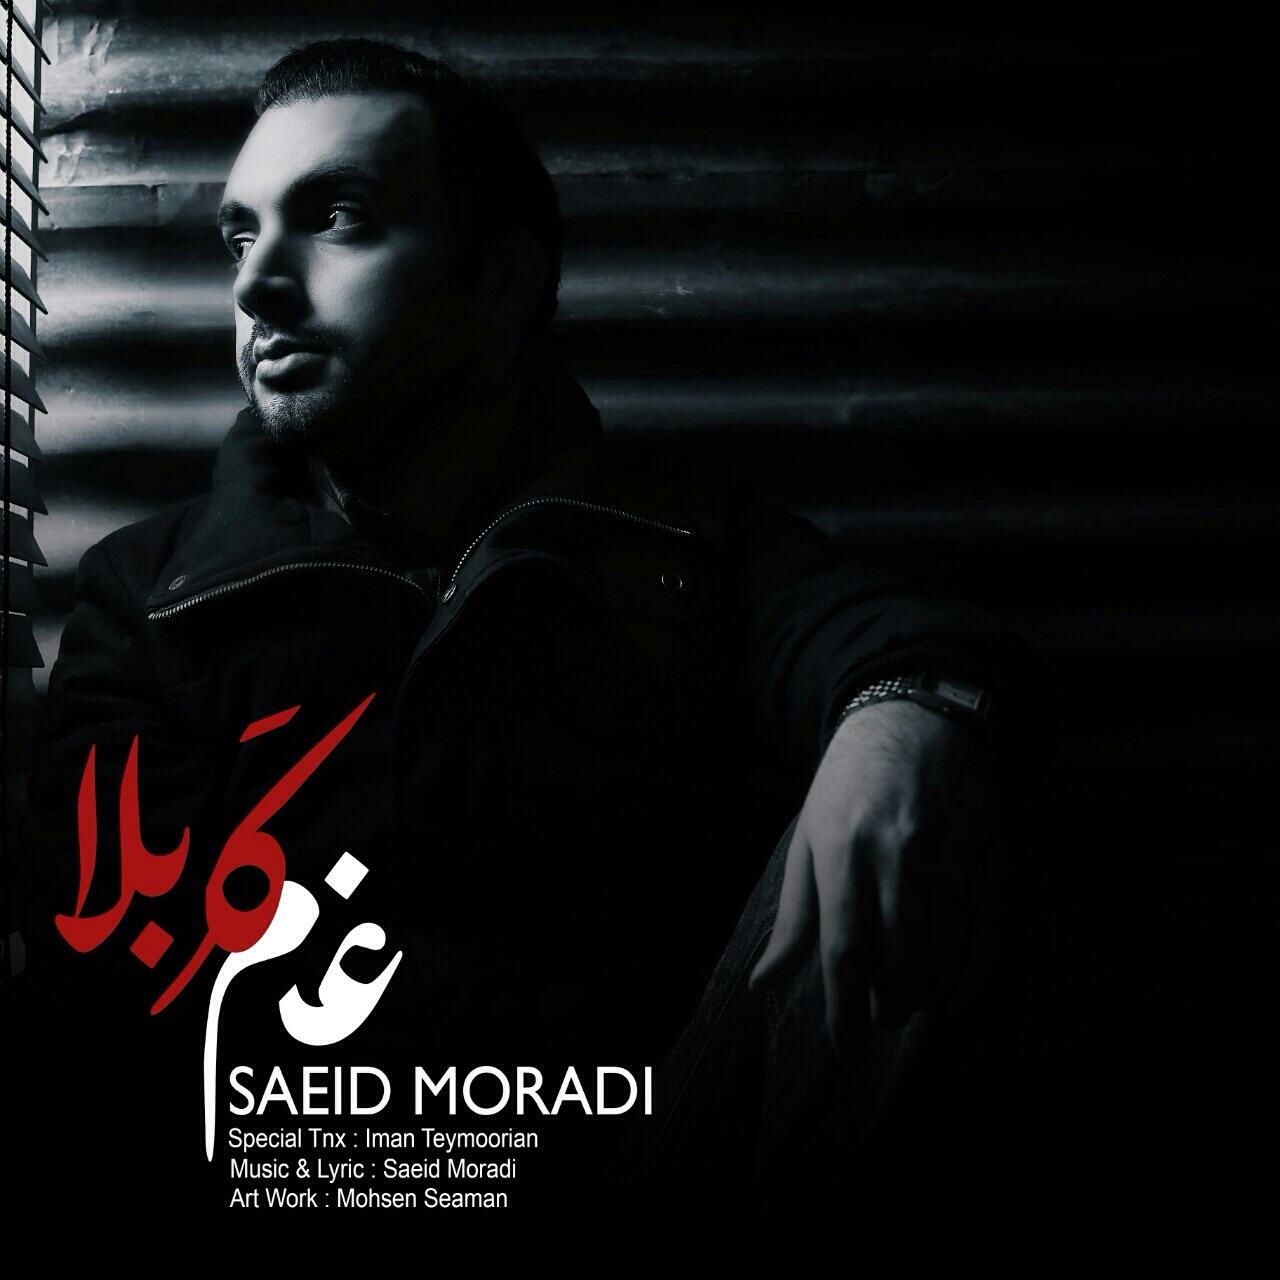 Saeid Moradi – Gholam Karbala